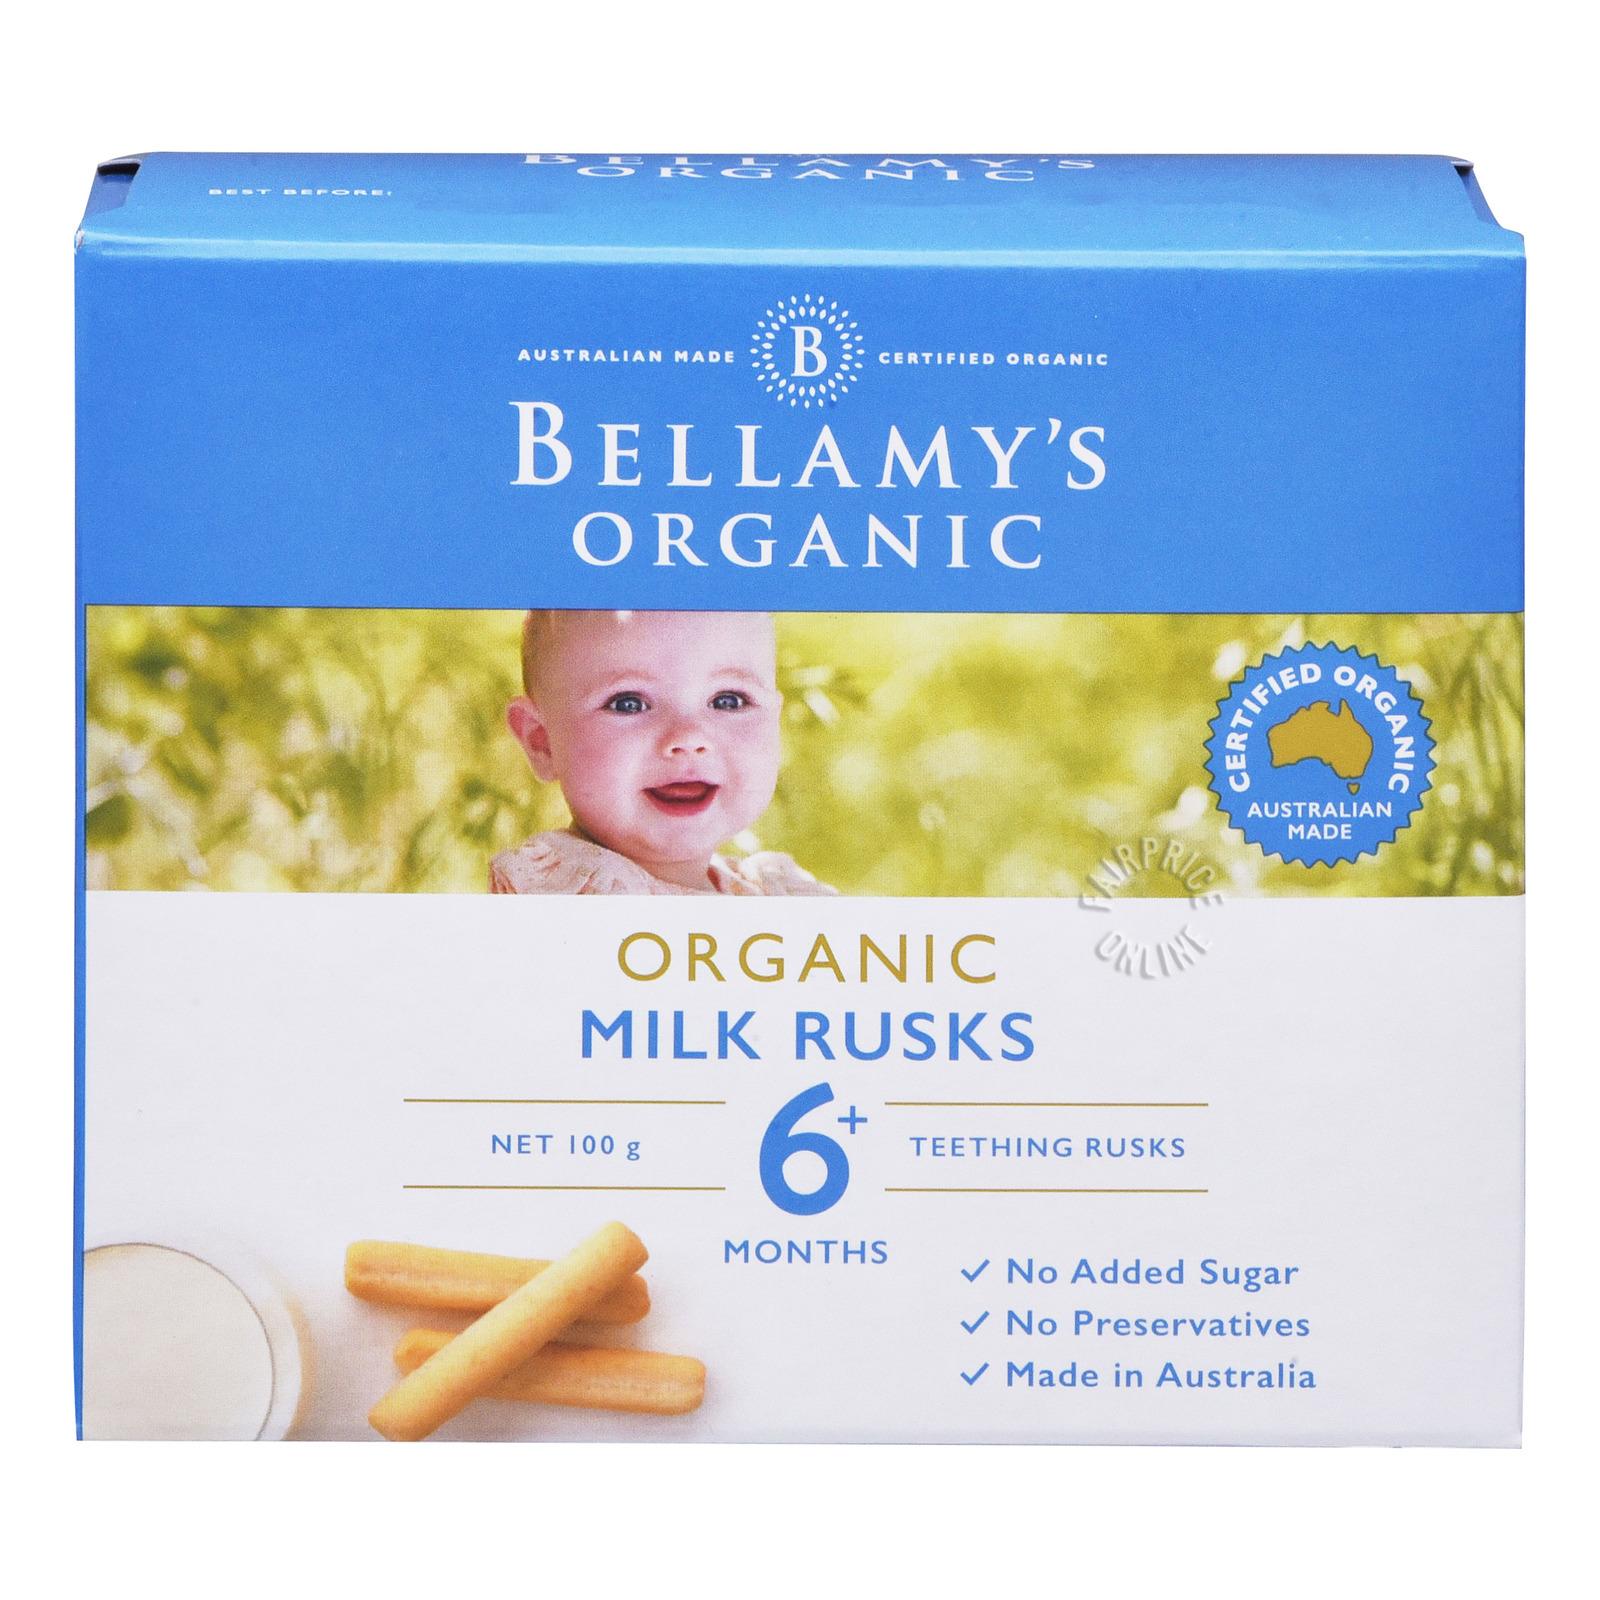 Bellamy's Organic Baby Milk Rusks